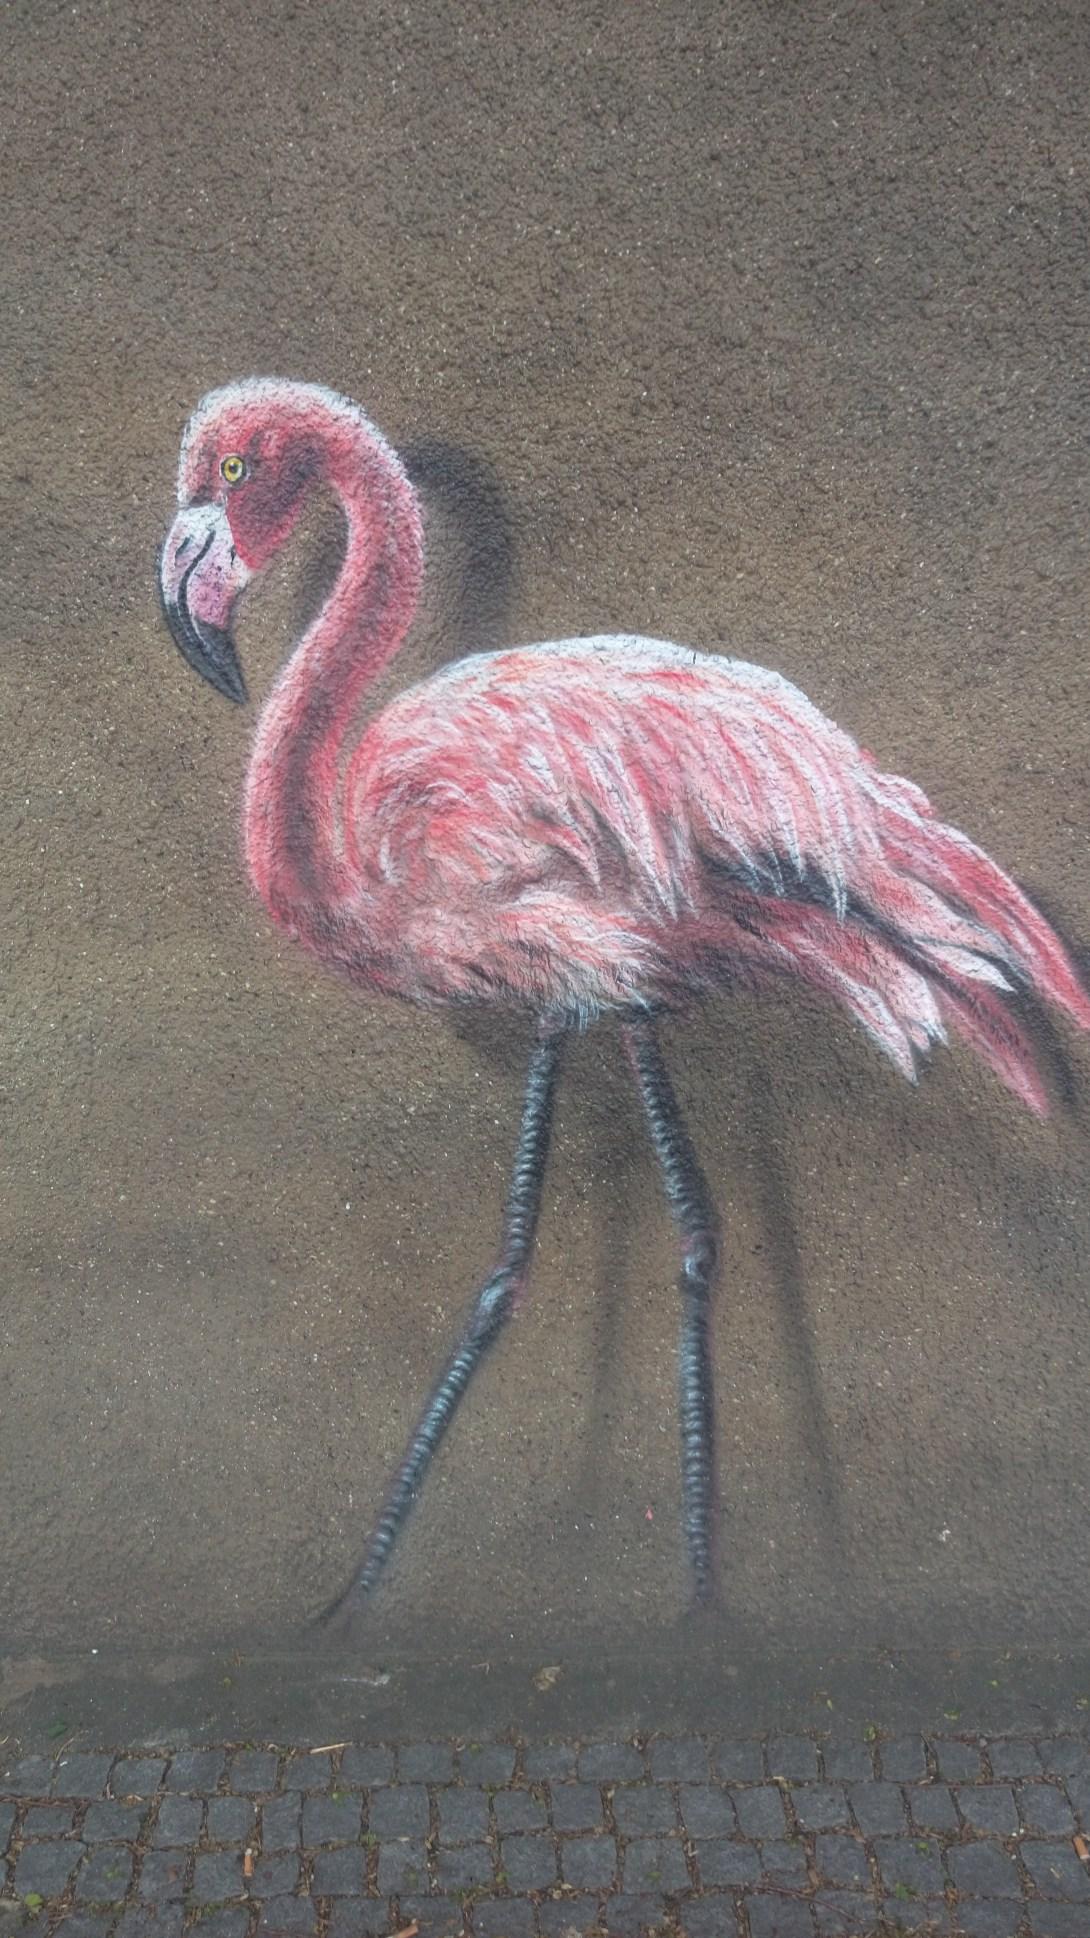 Tierpark Berlin Friedrichsfelde Flamingo Graffiti be kitschig blog